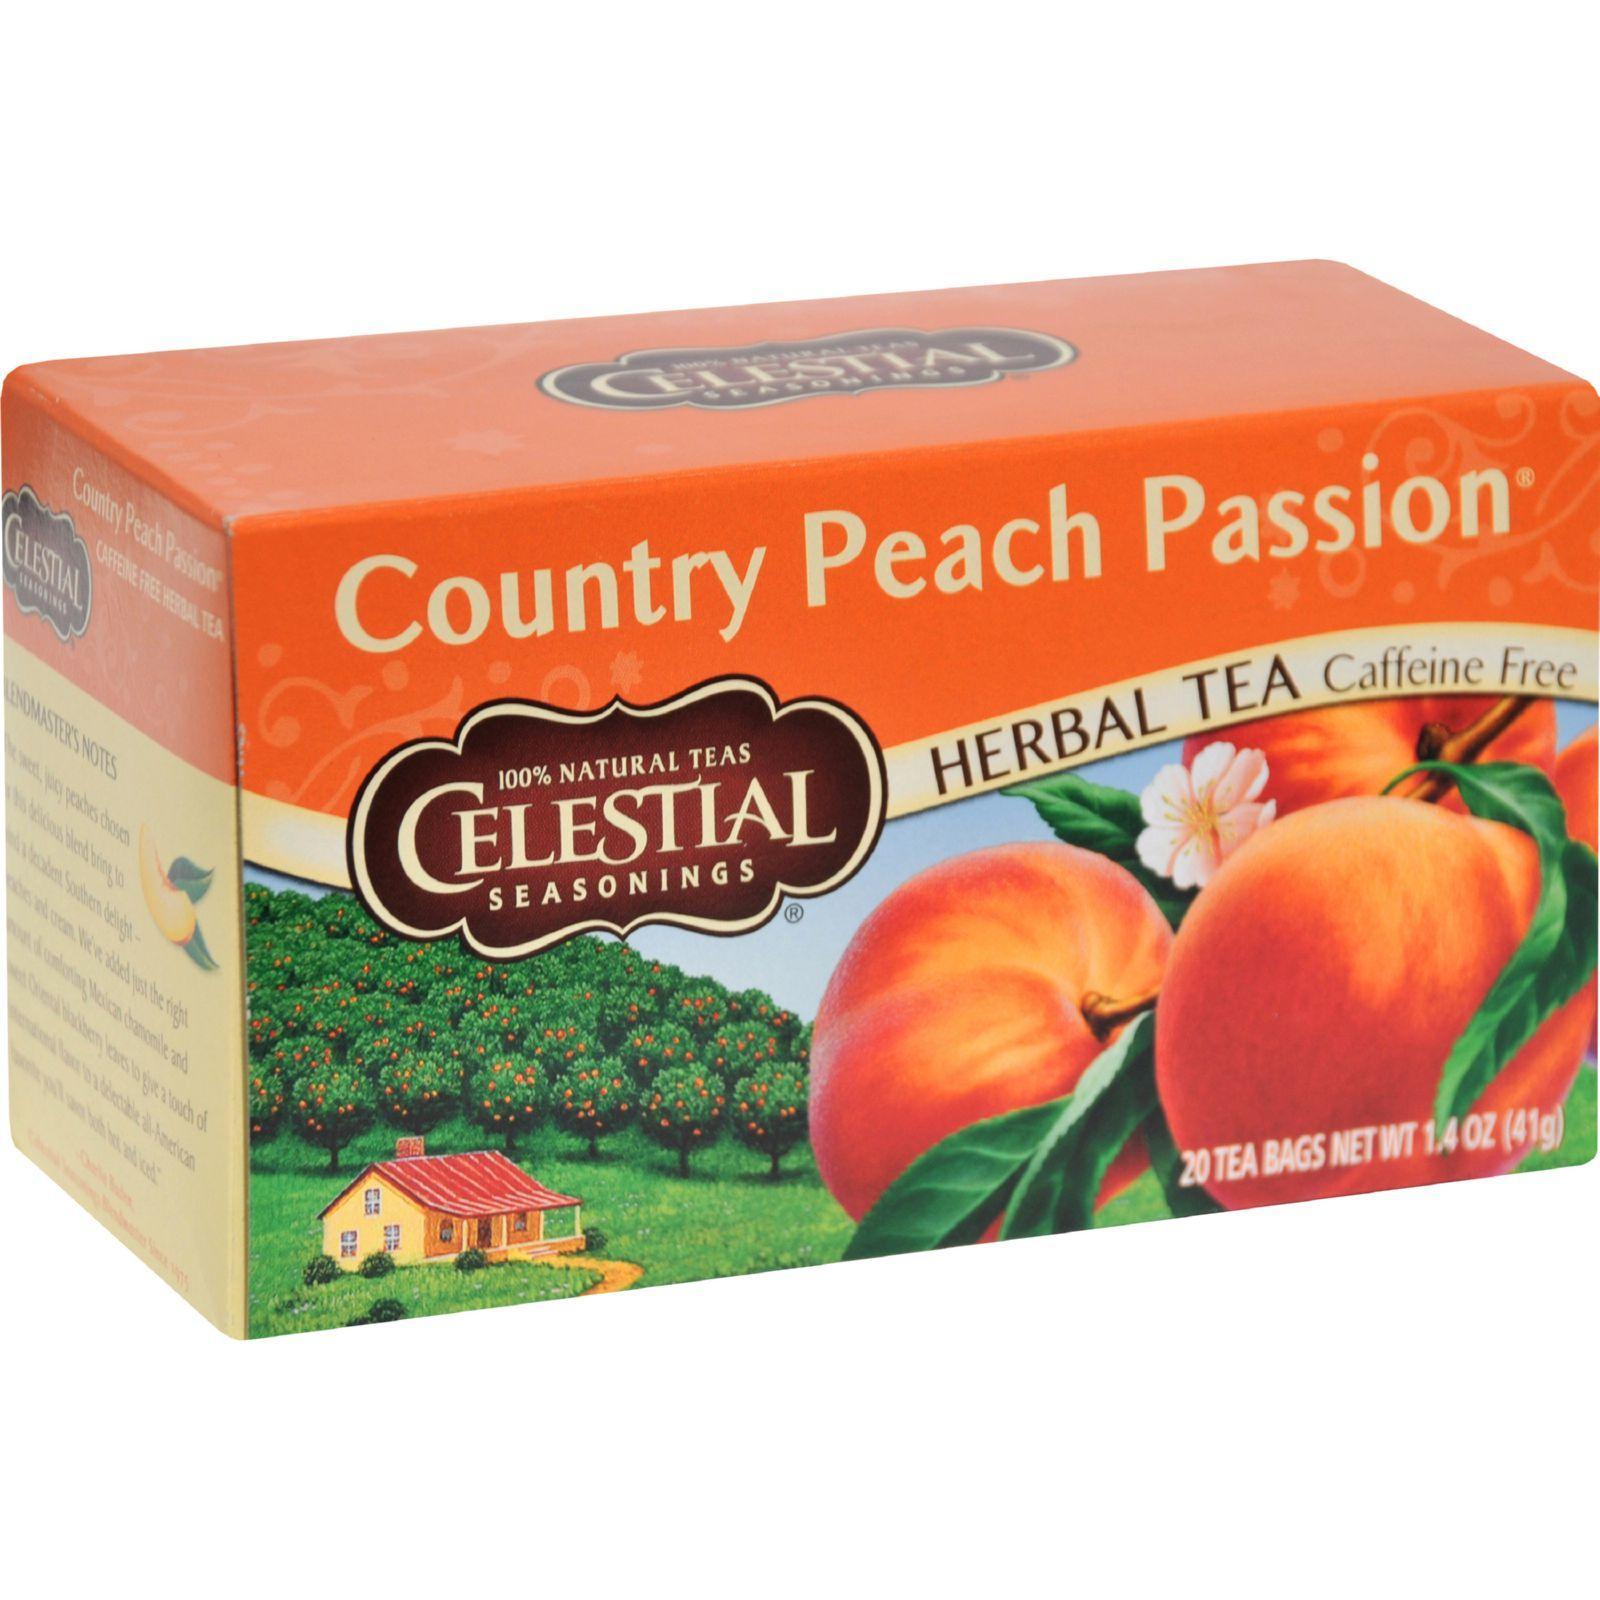 Celestial Seasonings Herbal Tea - Country P Passion - Caffeine Free - 20 Bags